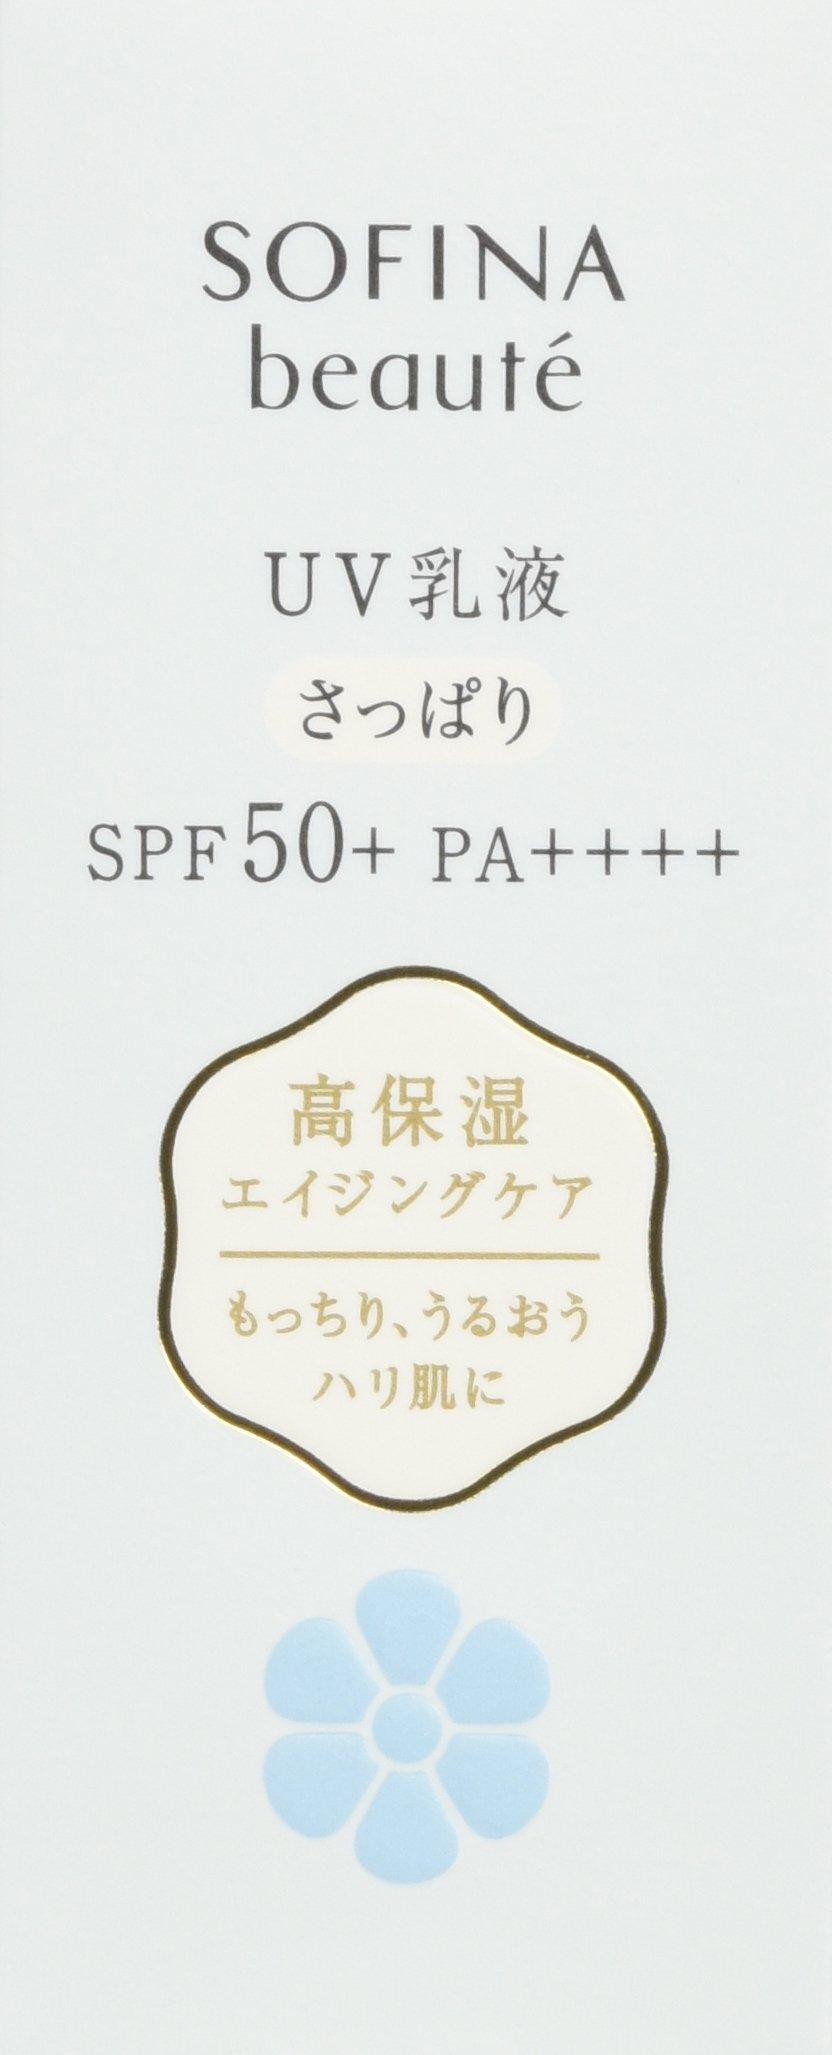 Sofina Kao Beaute UV Milk Sunscreen SPF 50+ Pa++++, 1 Ounce